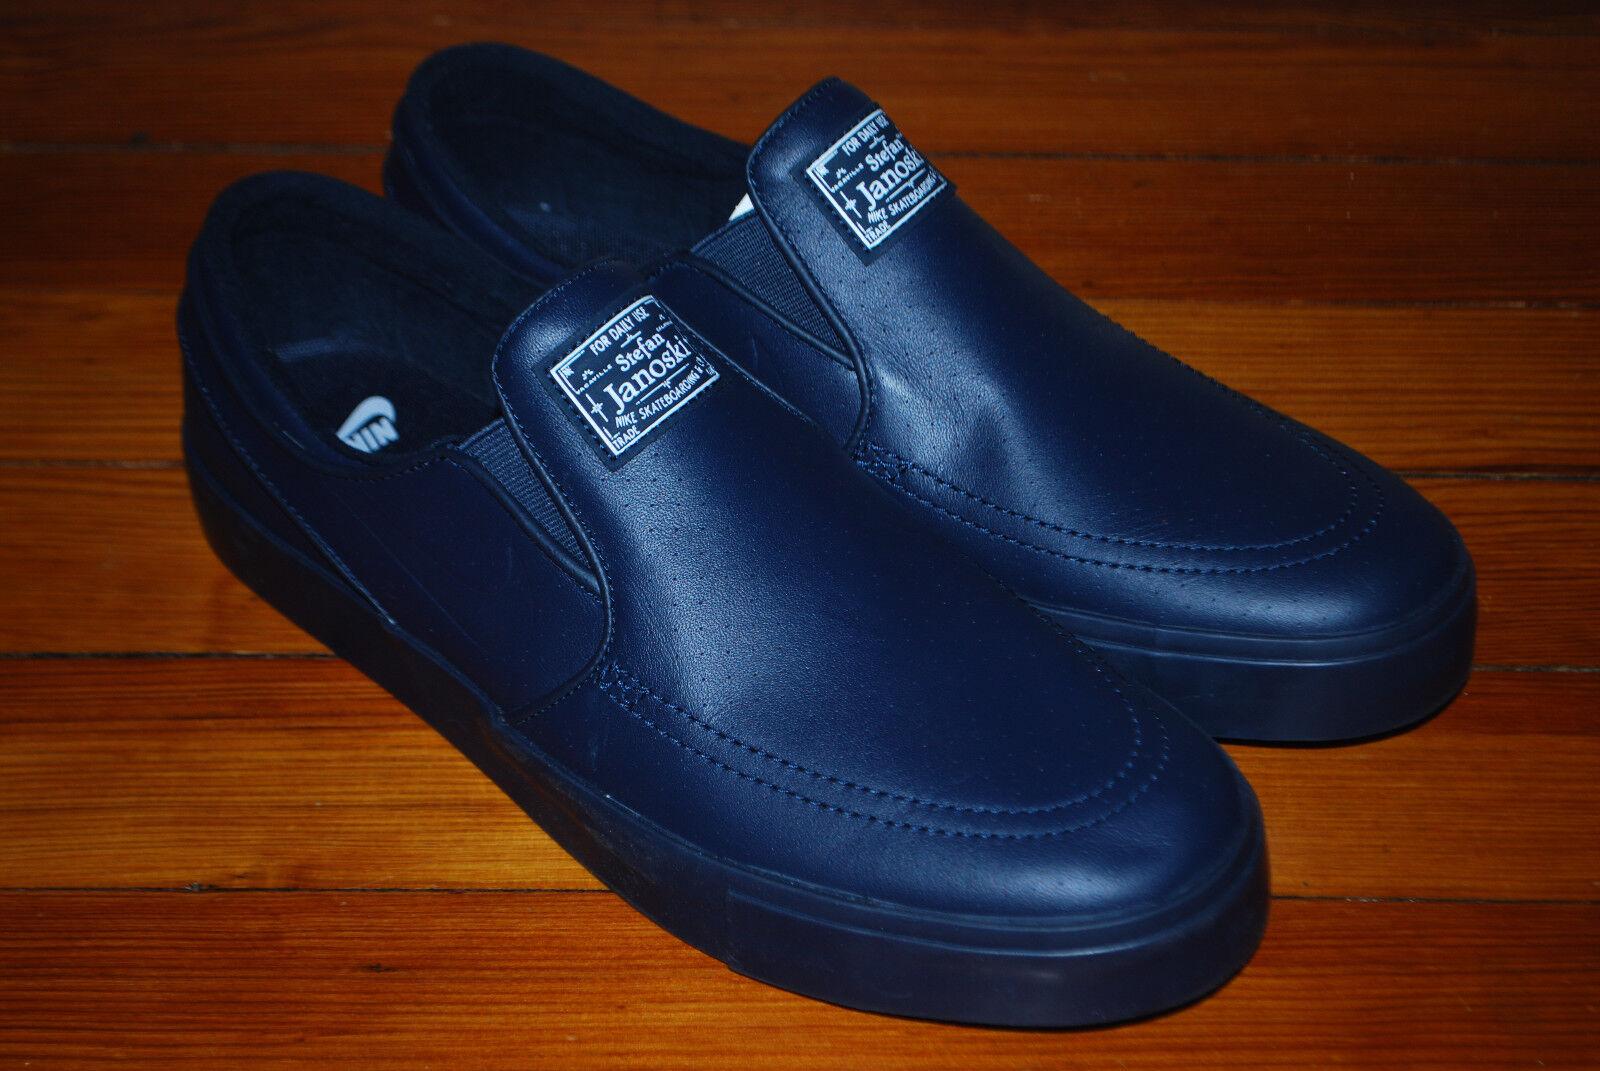 Nike SB Zoom Stefan Janoski Slip-On PRM Navy bluee shoes (11, 11.5, 12) 833582-441